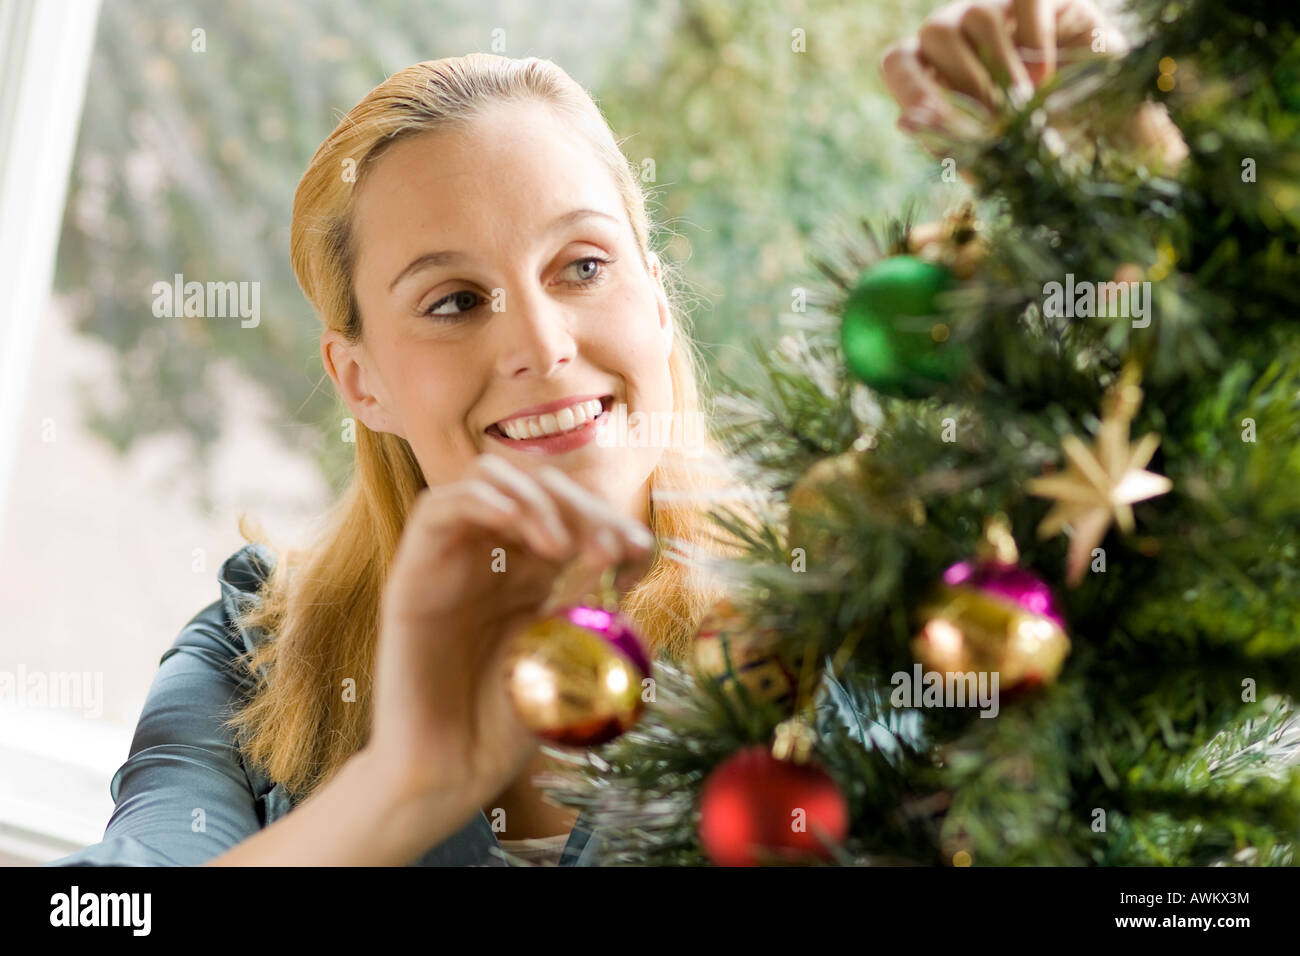 woman decorating the Christmas tree - Stock Image